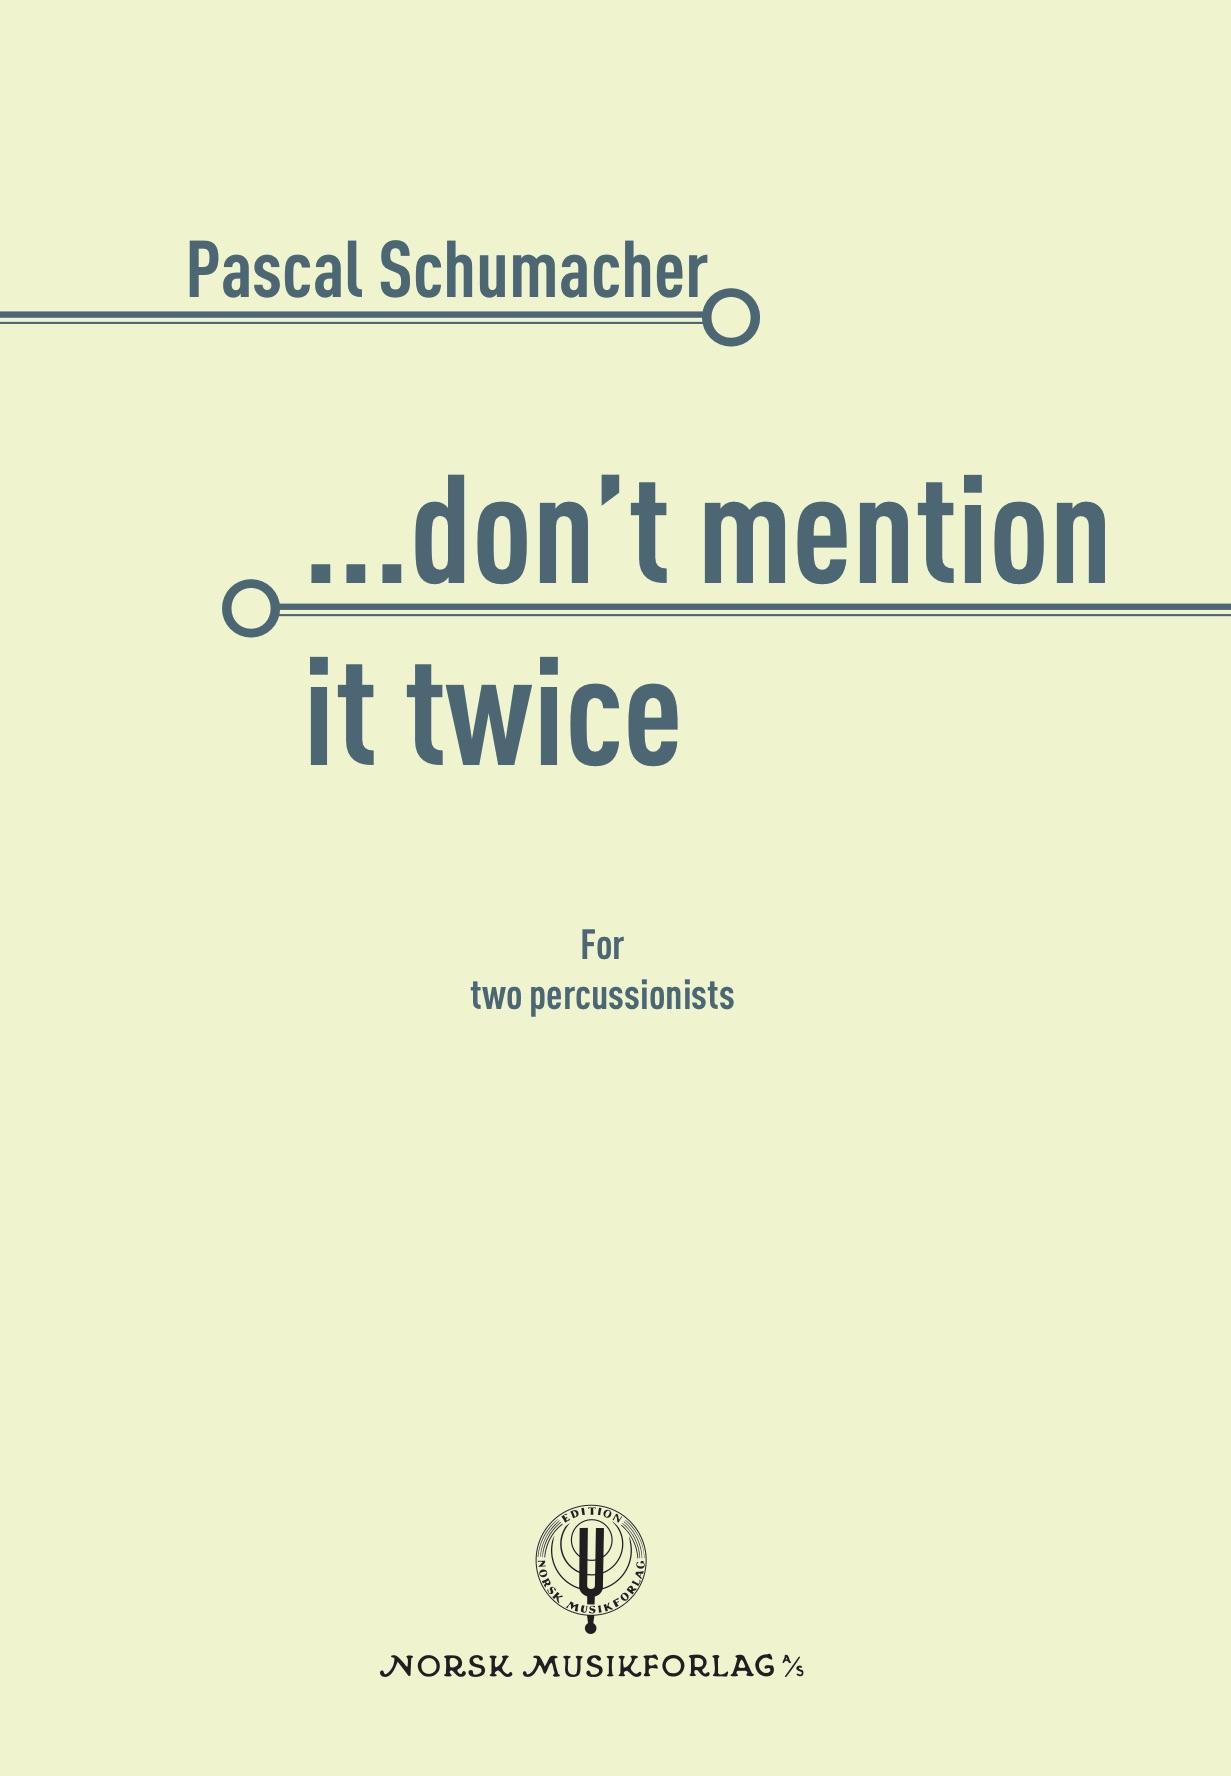 PASCAL SCHUMACHER: ...don't mention it twice